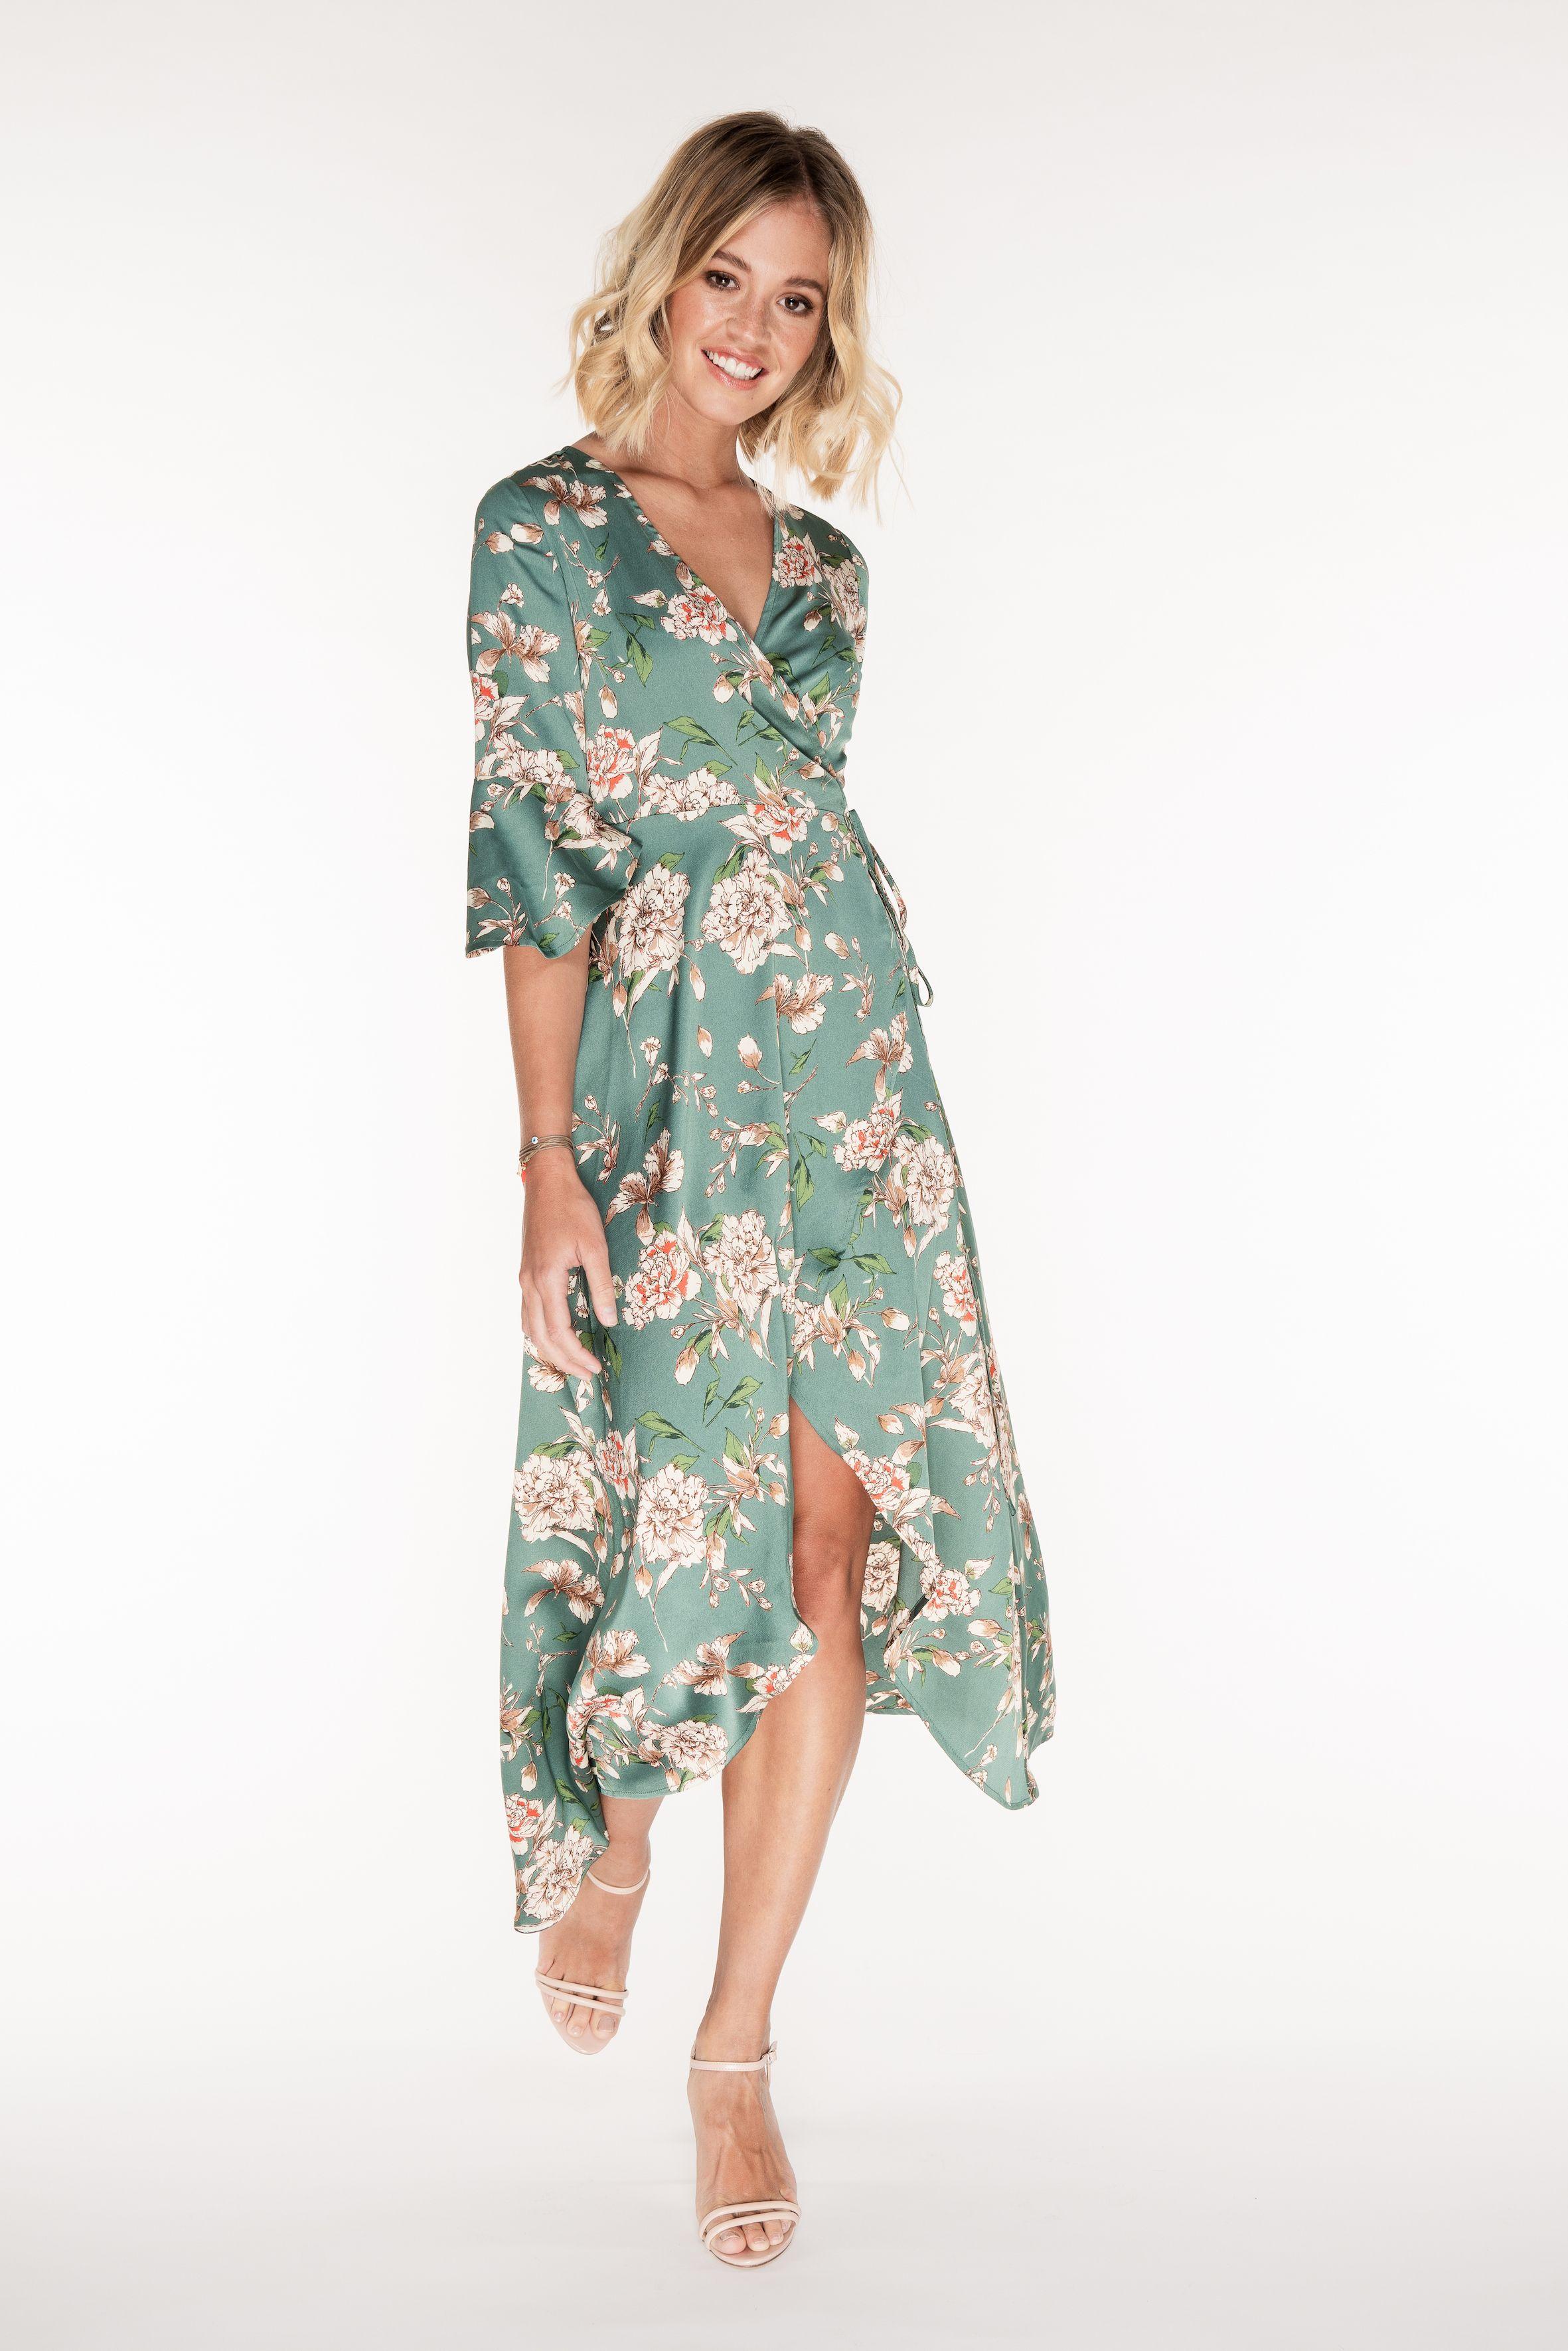 Pippa Green Floral Ruffle Wrap Dress Wrap Dress Maxi Dress Collection Dresses [ 3541 x 2362 Pixel ]